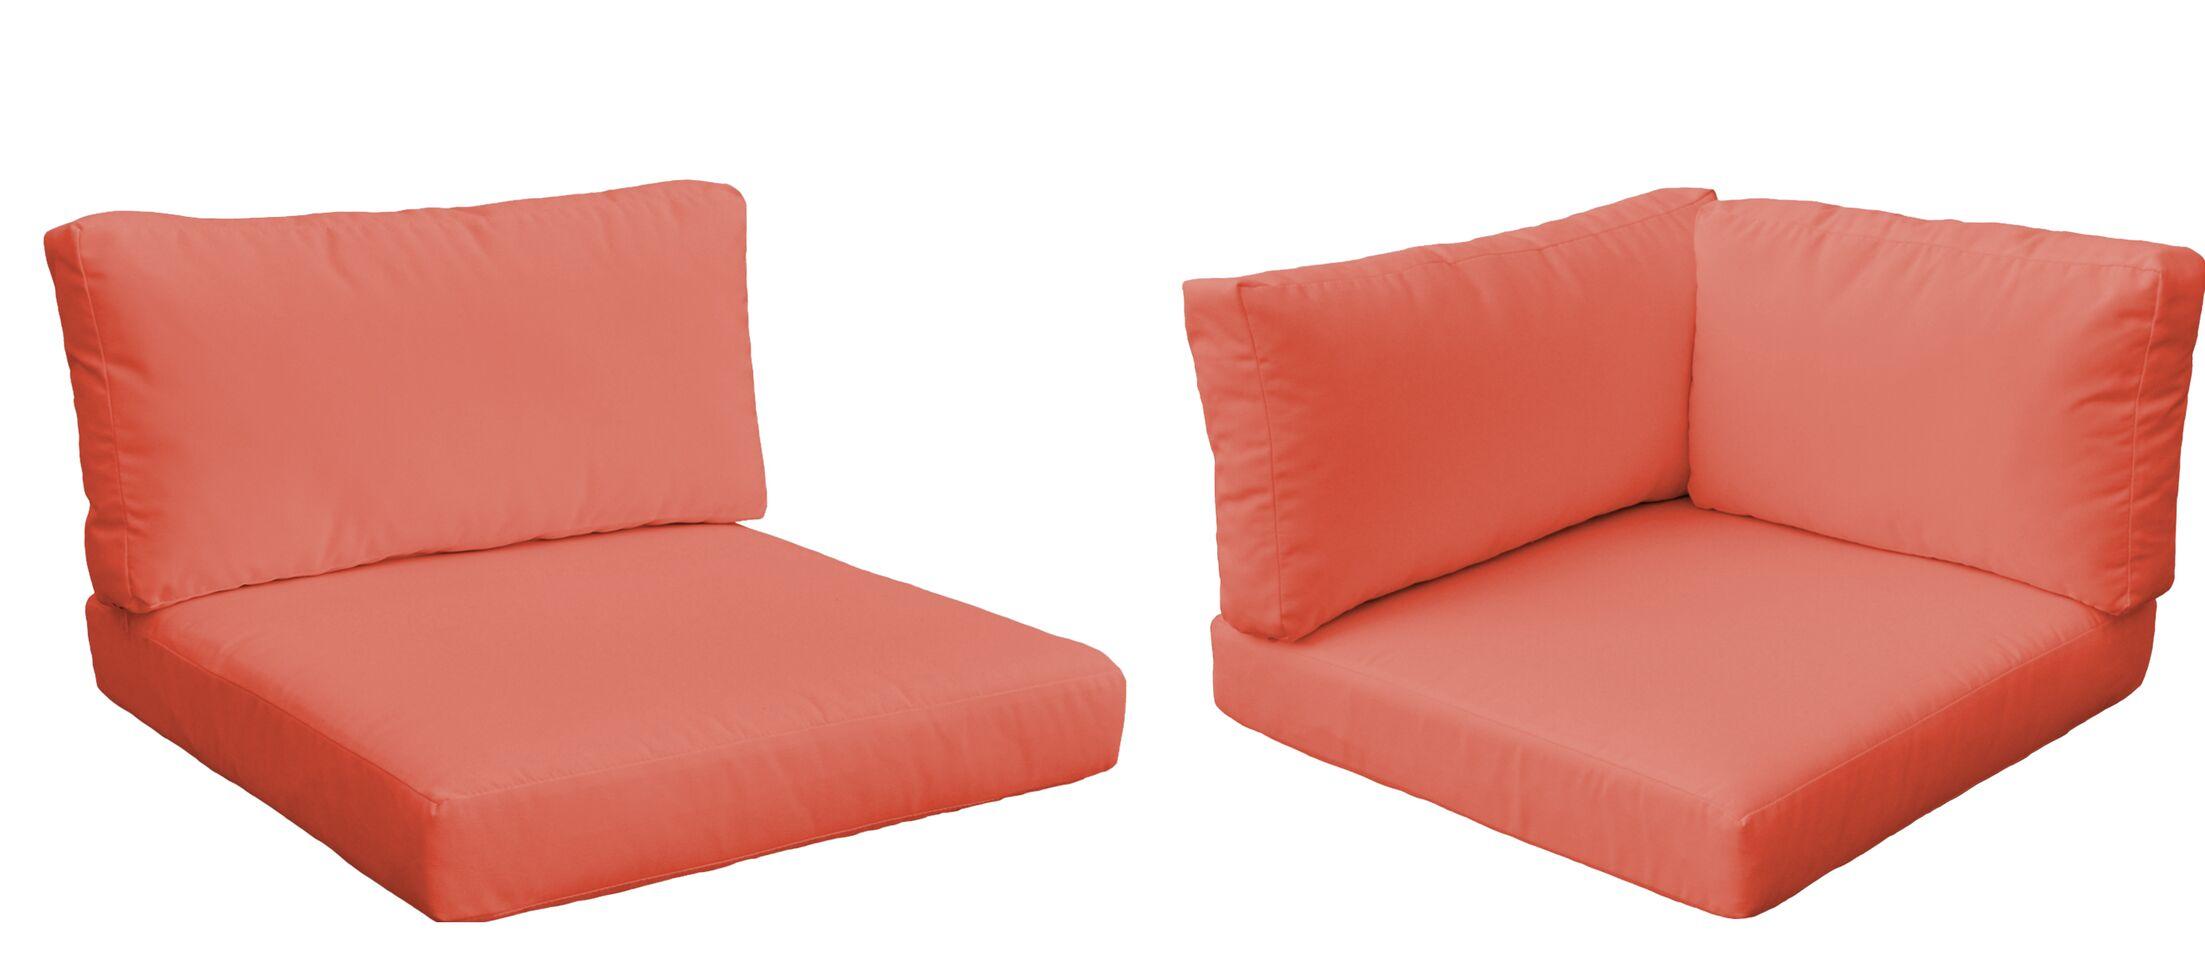 Monaco Outdoor 10 Piece Lounge Chair Cushion Set Fabric: Tangerine